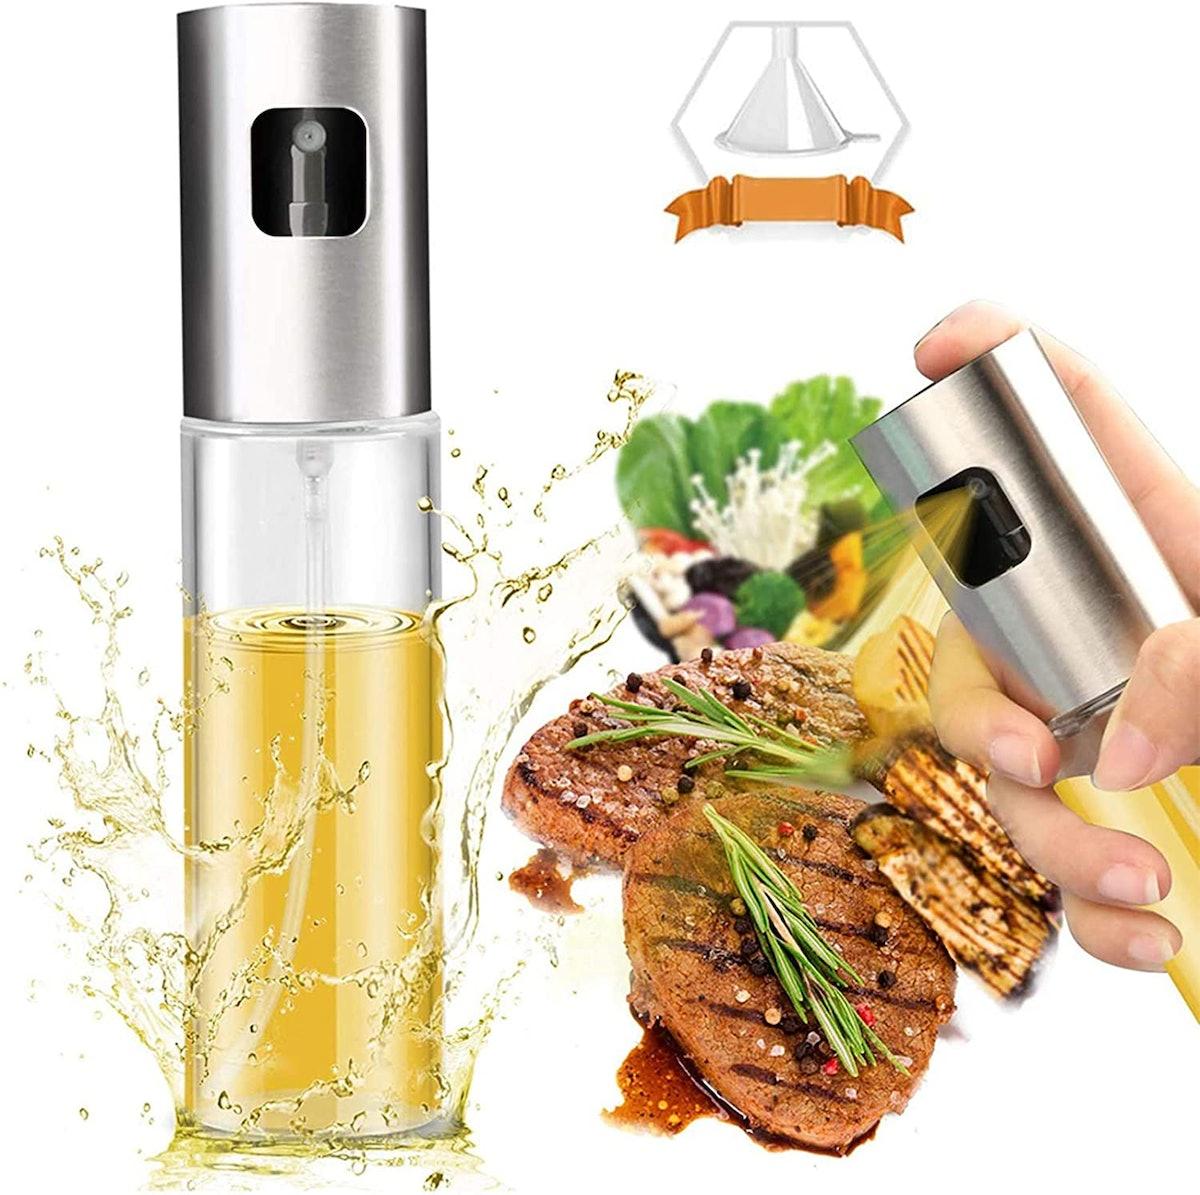 PUZMUG Olive Oil Sprayer Dispenser